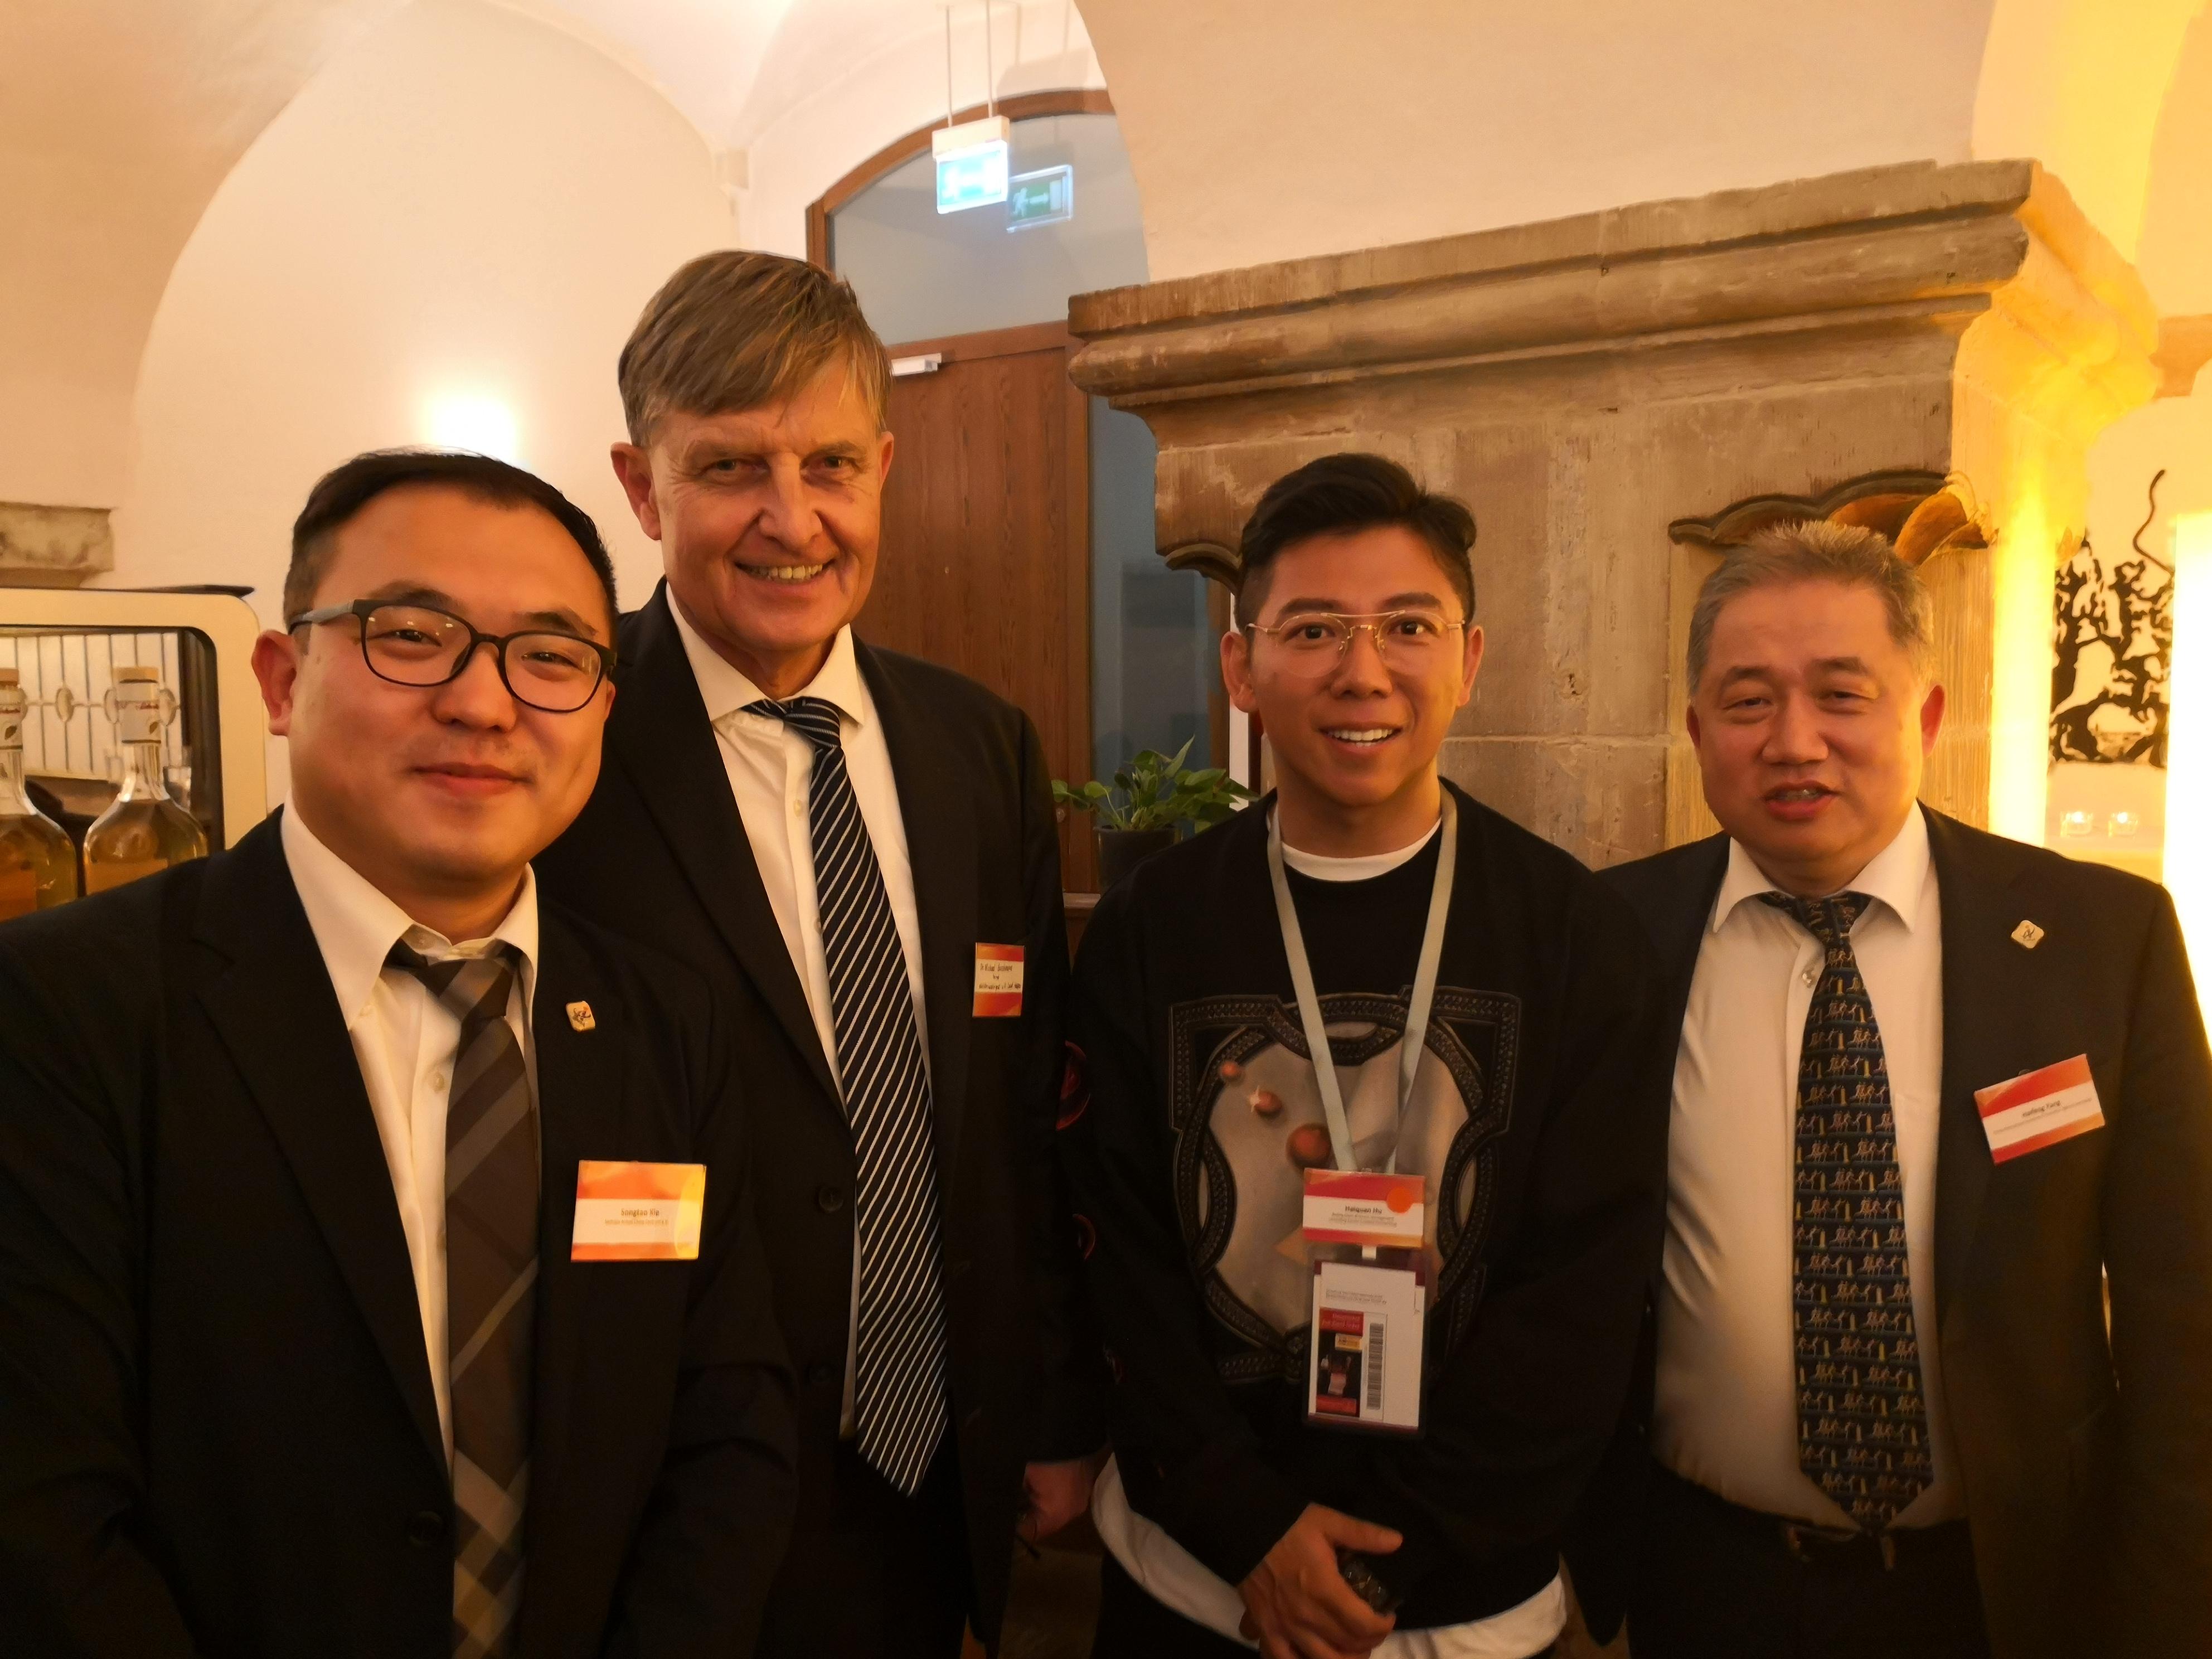 Ein Stelldichein in Magdeburg gab sich auch der in China sehr berühmte Sänger HU Haiquan (2.v.r.), hier mit CIIPA-Vertretern, u.a. CIIPA-Repräsentant in Magdeburg XIE Songtao (links).